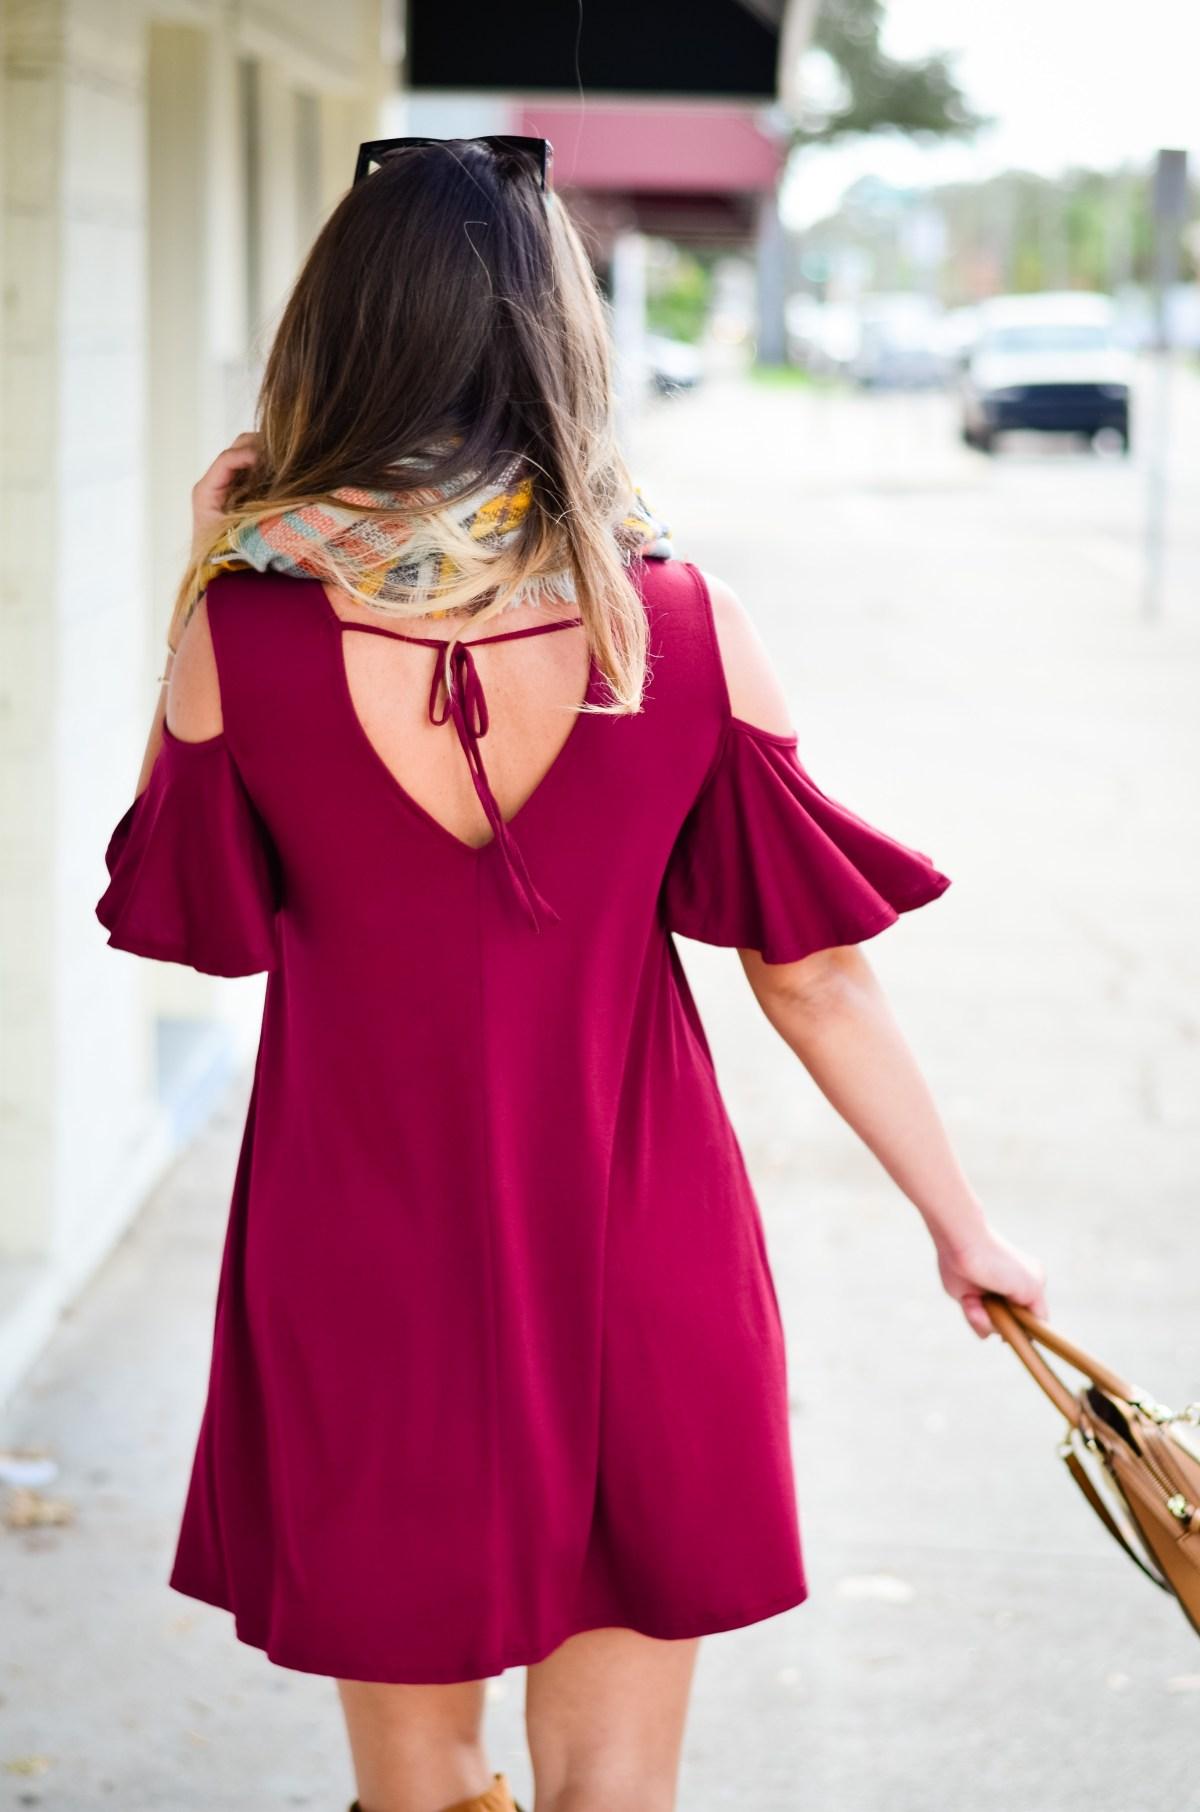 maroon-dress-blanket-scarf-goldfinch-21